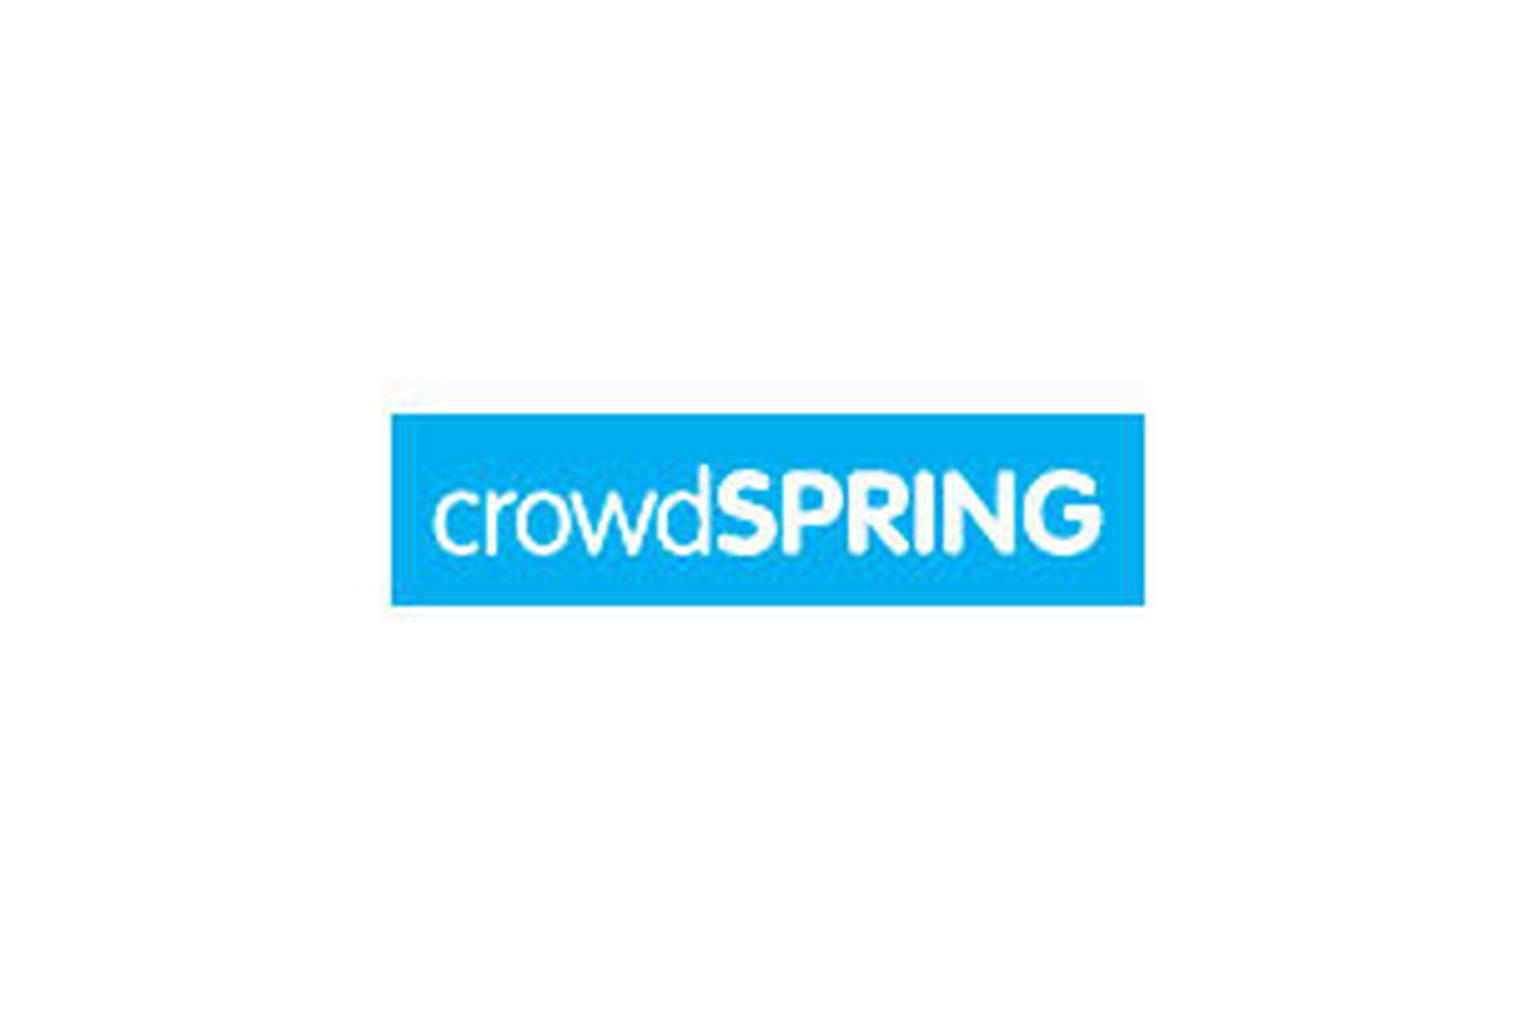 CrowdSPRING customers enjoy discounts from BizFilings